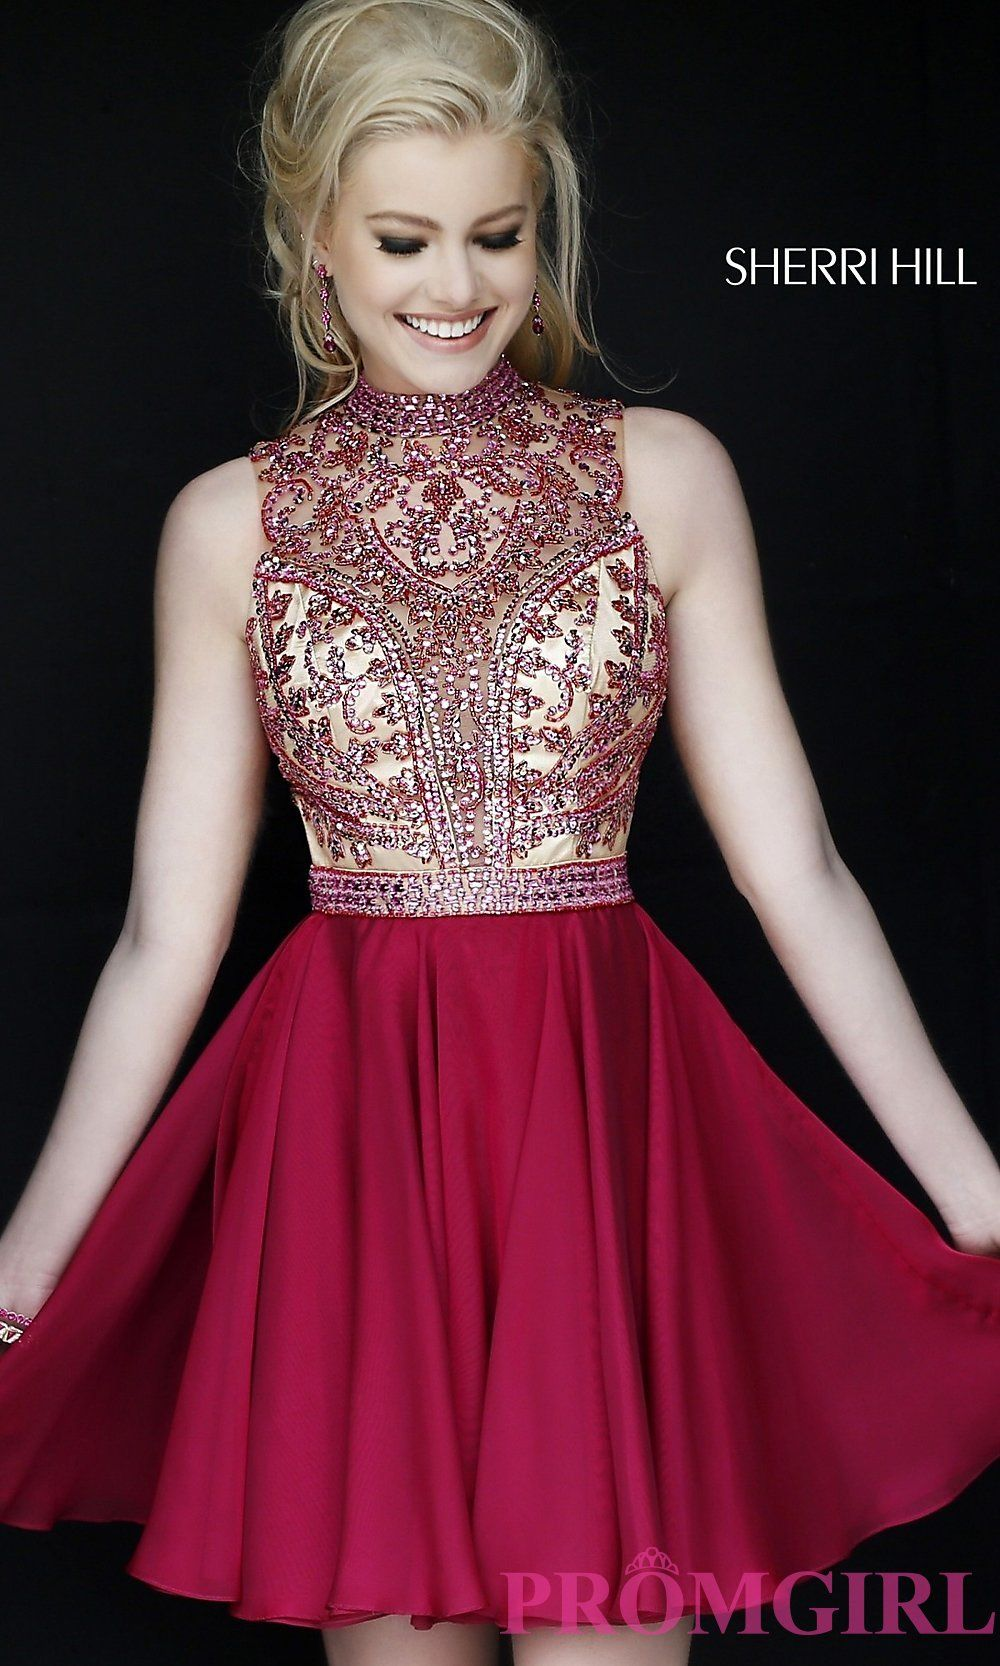 fd74973cf36a Prom Dresses, Celebrity Dresses, Sexy Evening Gowns: Short Strapless Sherri  Hill Dress